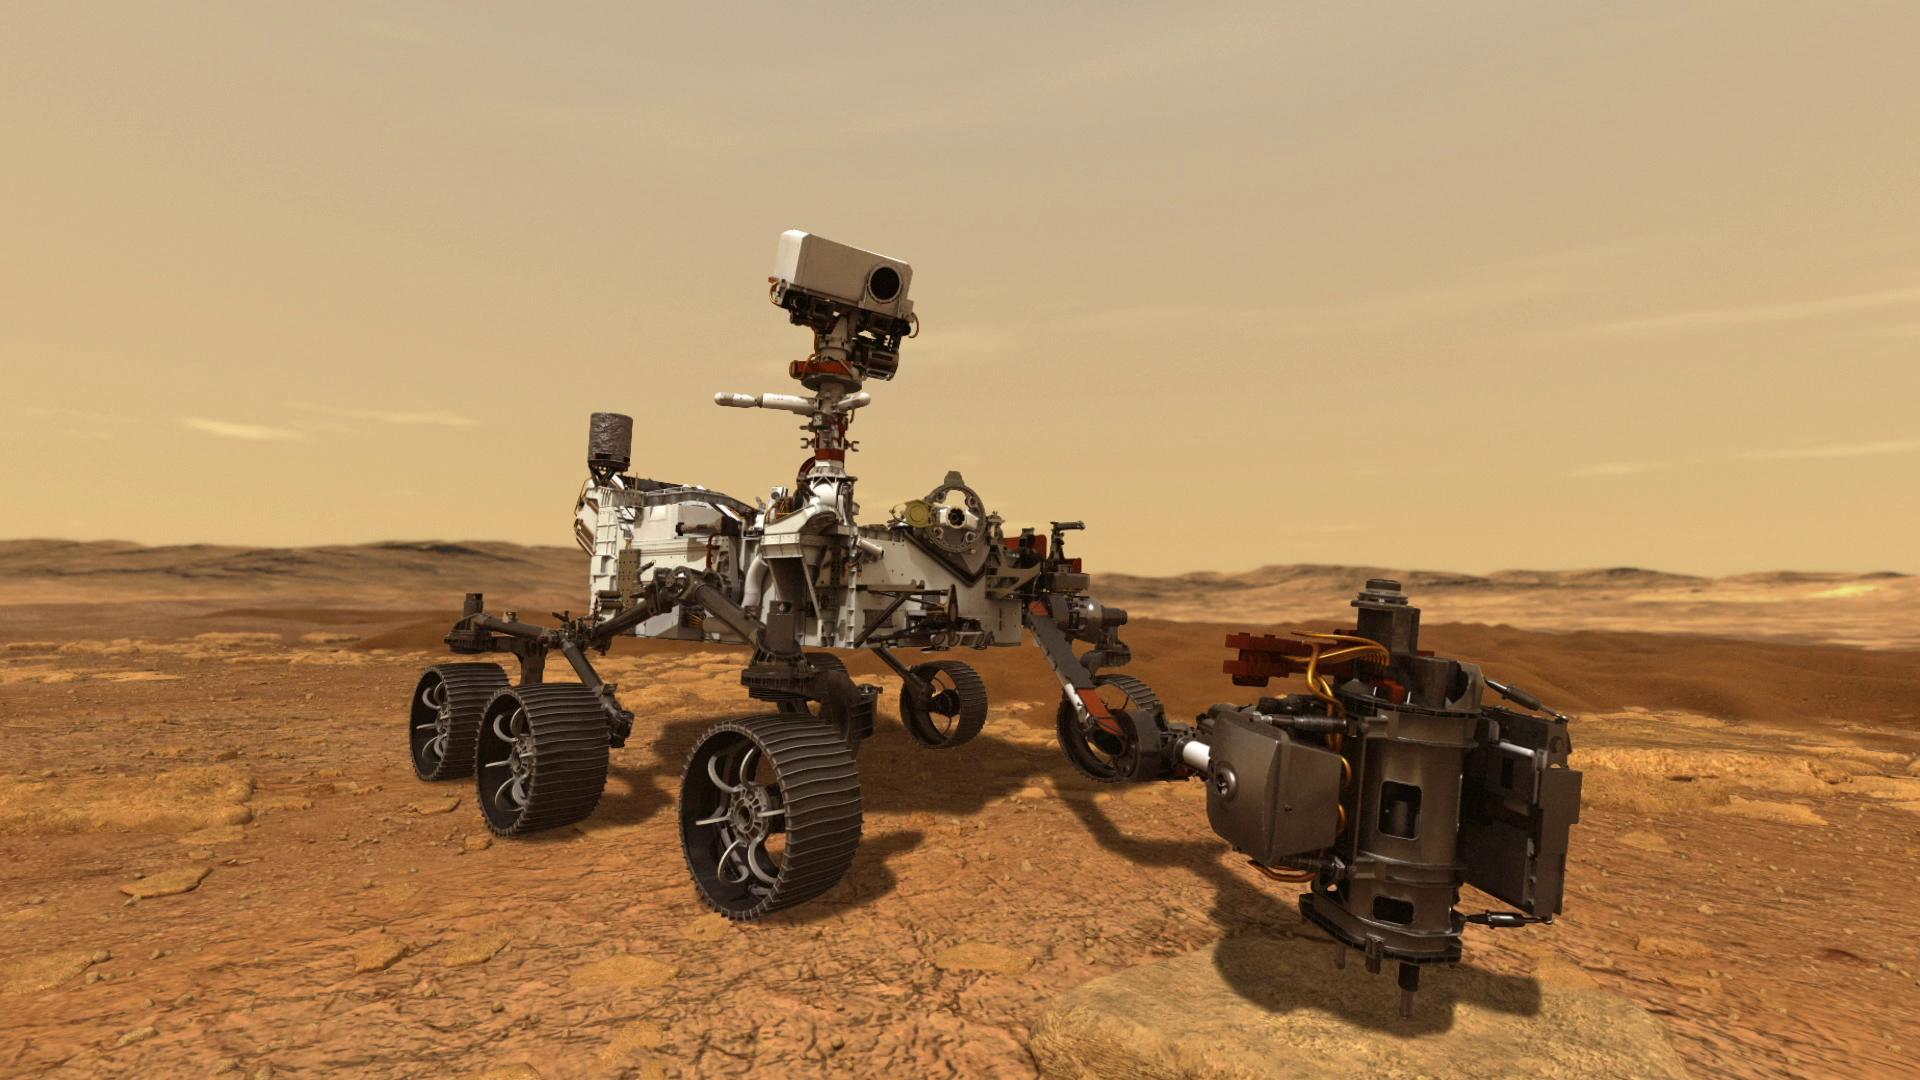 VIDEO: NASA video of Perseverance rover landing on Mars